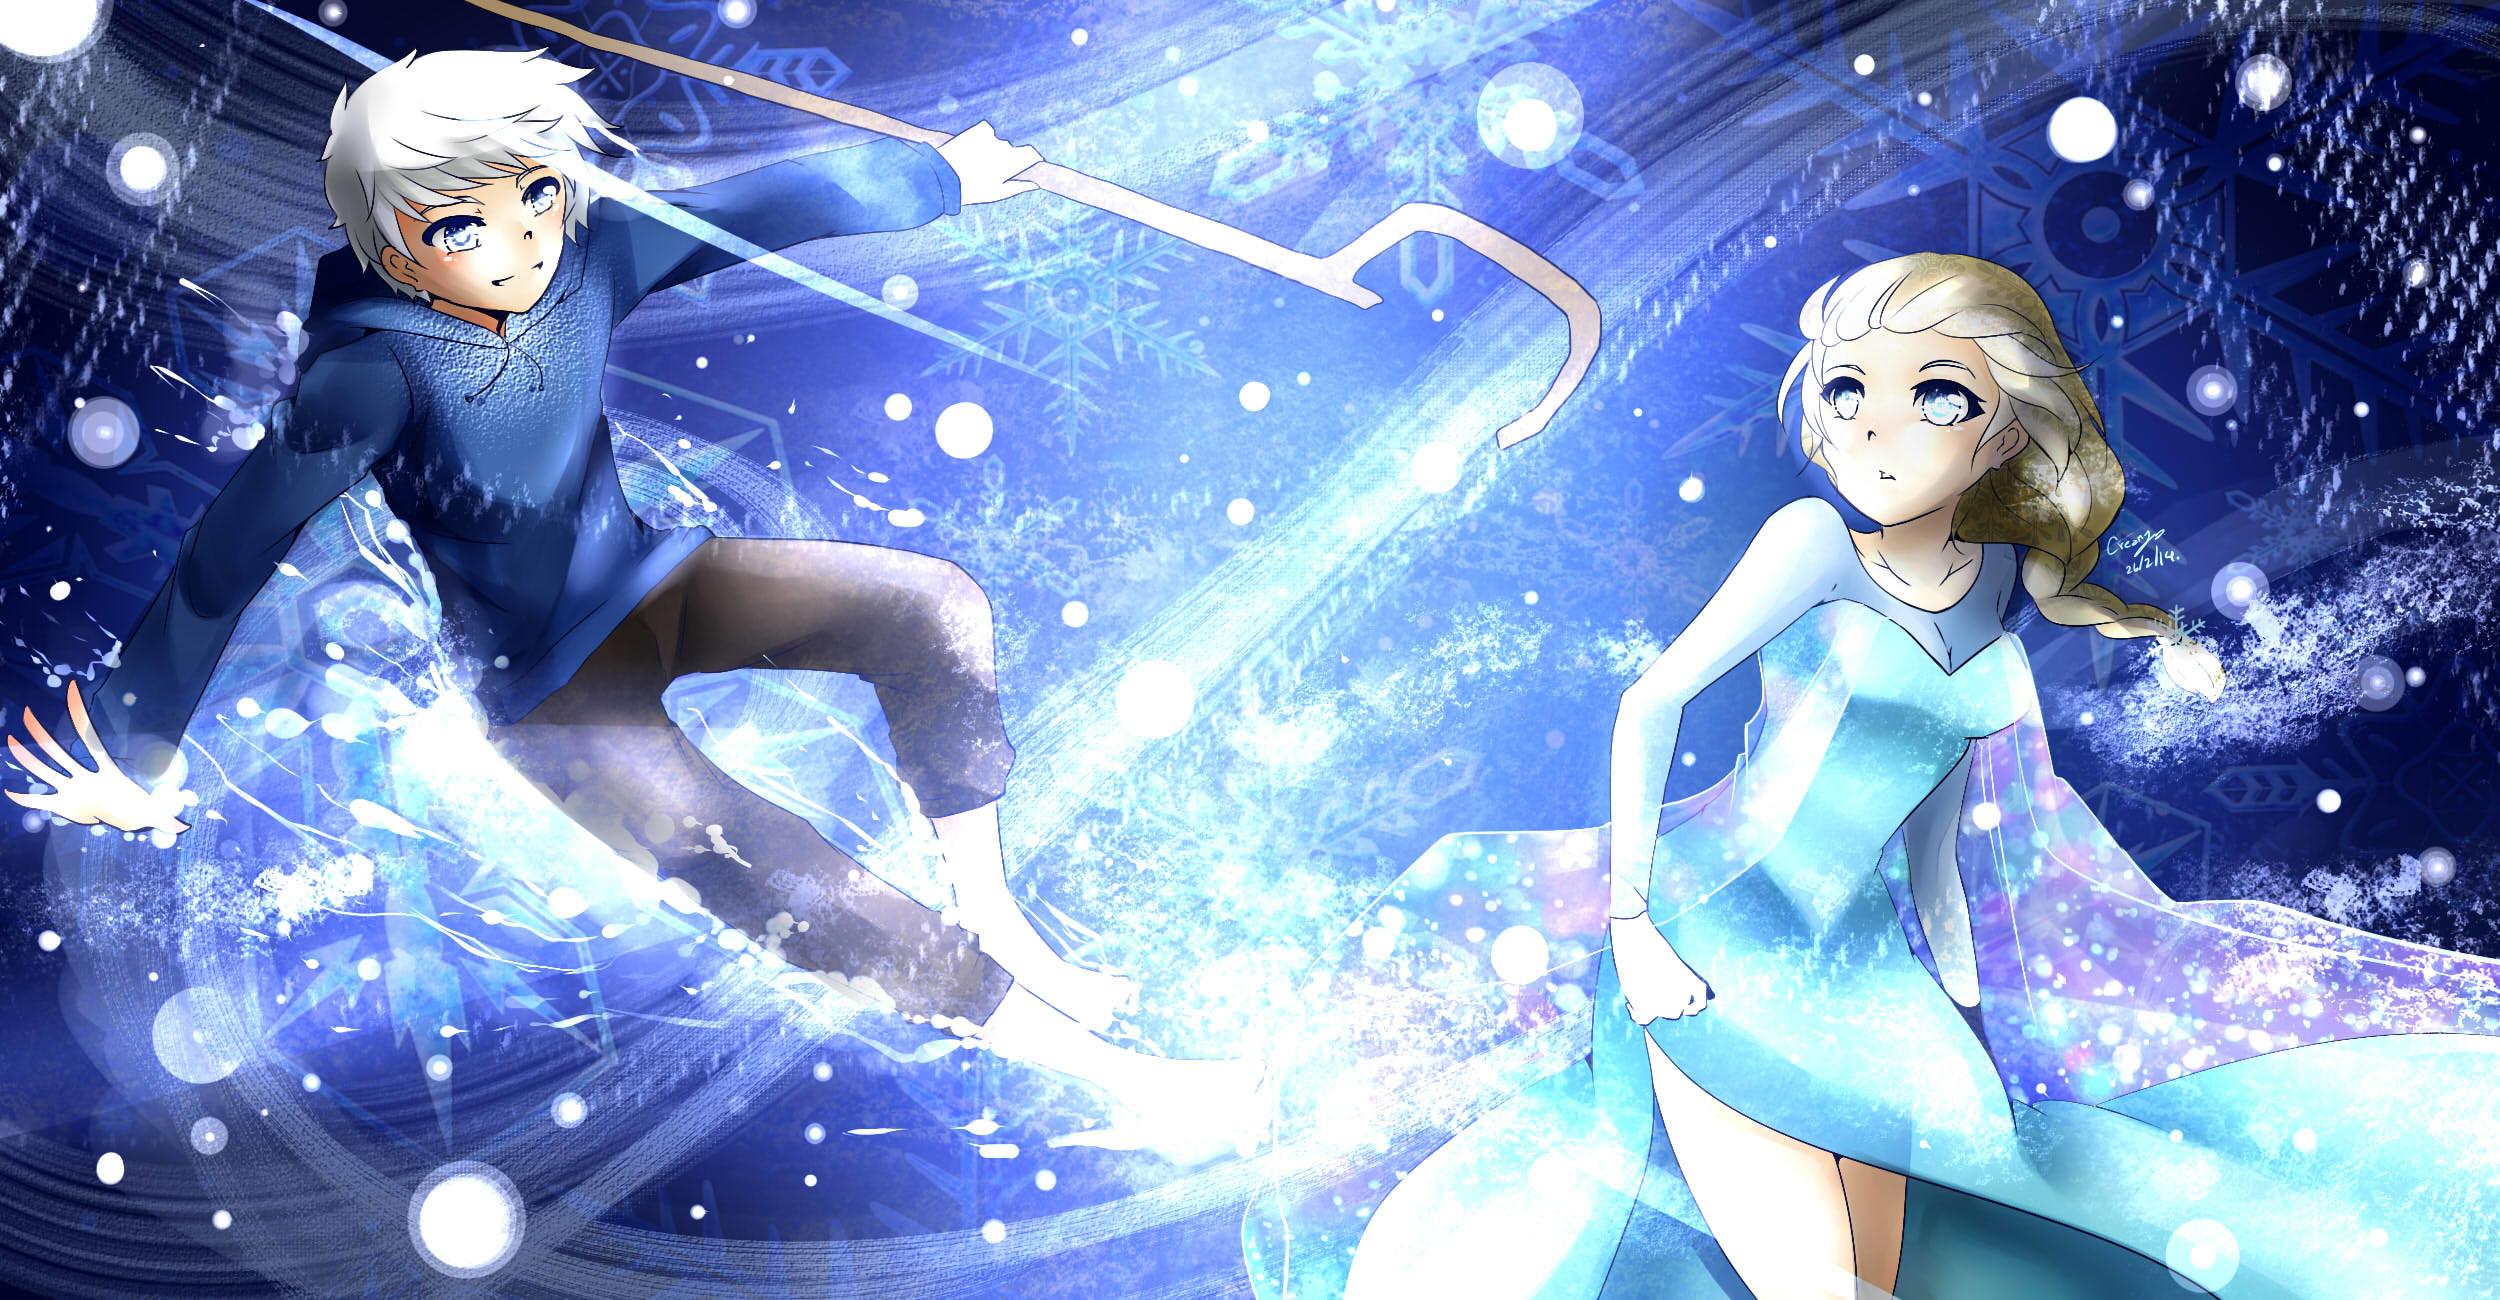 Jack forst and Elsa by creamycreama Jack forst and Elsa by creamycreama